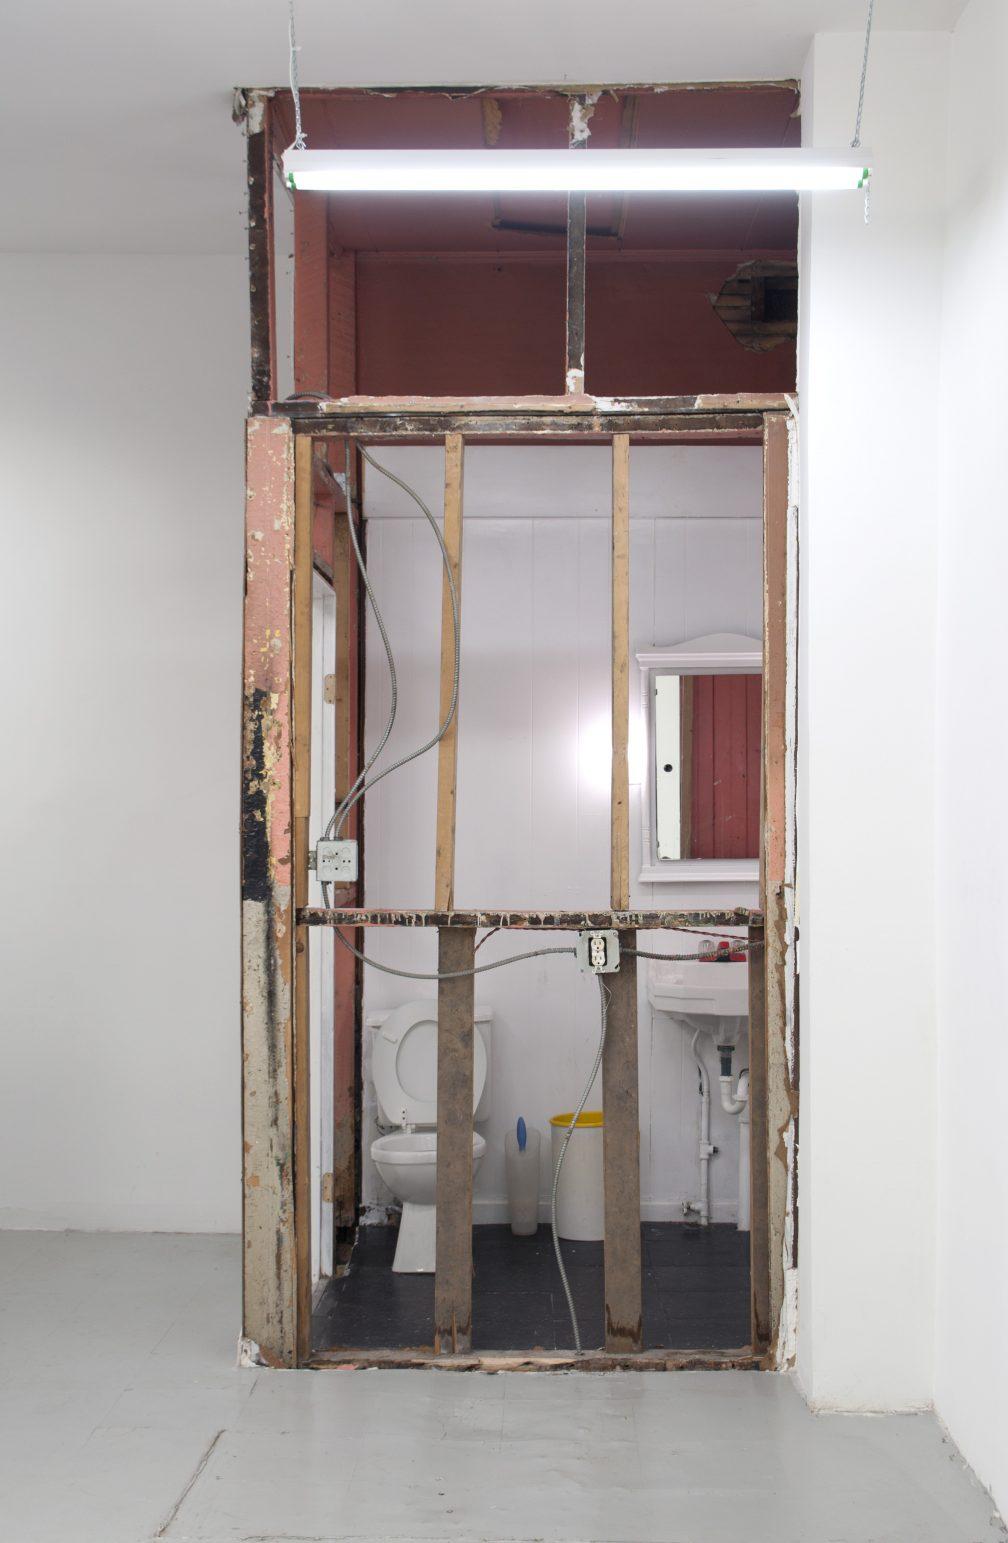 Untitled (Skeleton), bathroom drywall removal, 2014